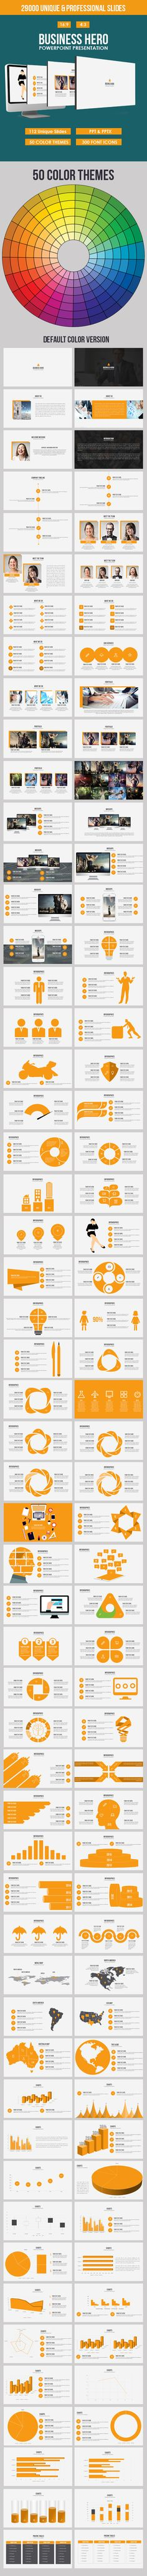 Business Hero Powerpoint Presentation Template  #infographics #advertisement…